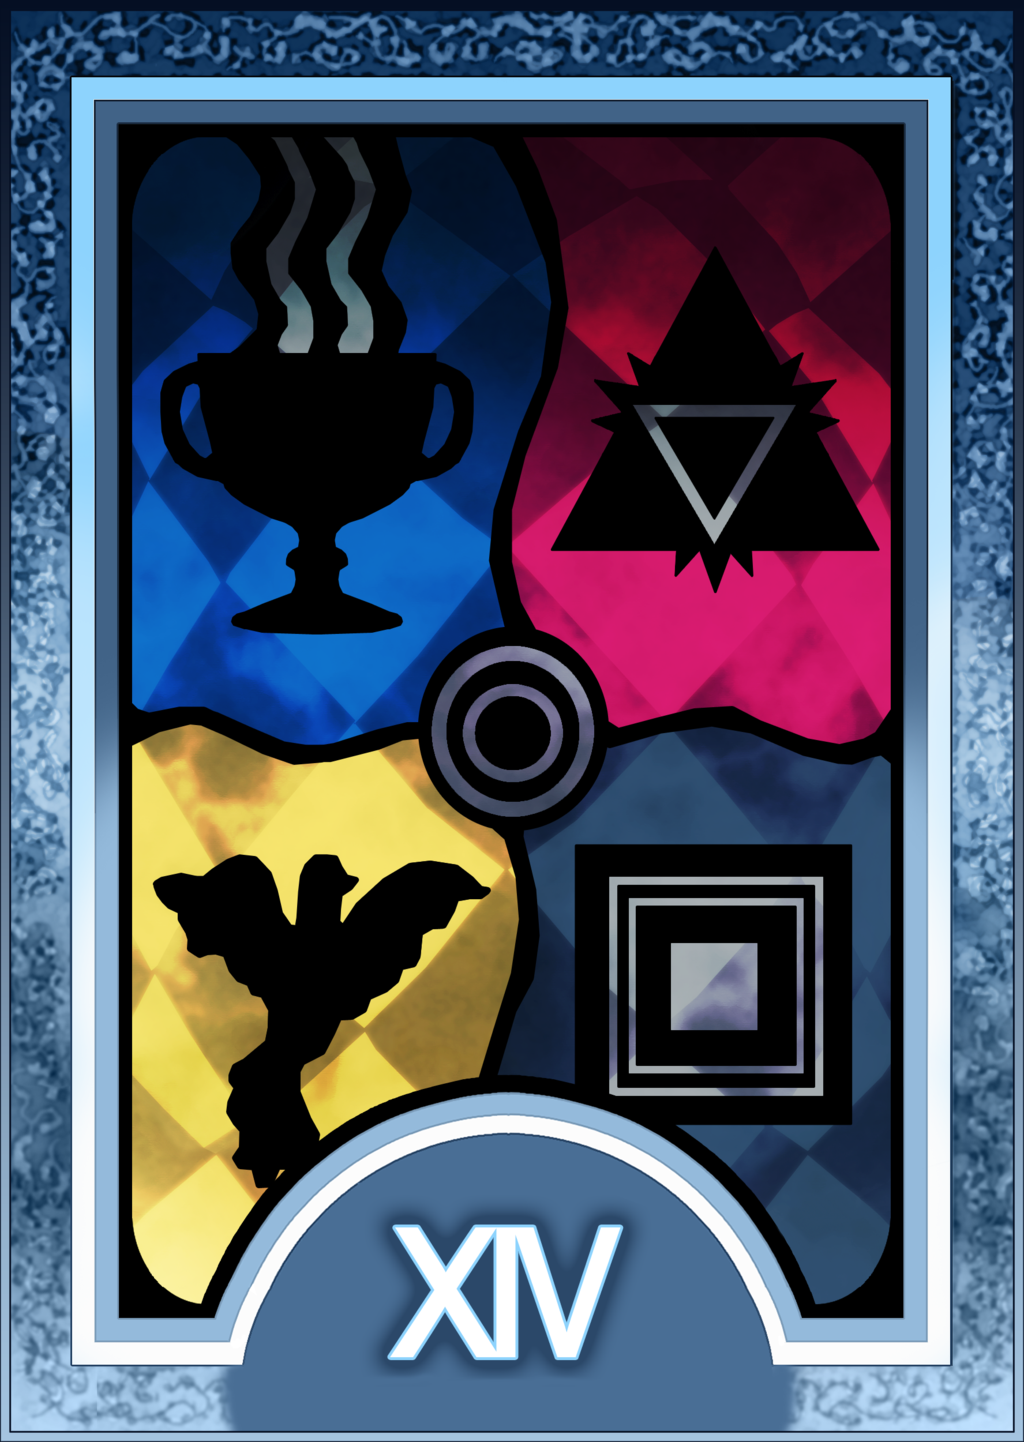 Persona 3 4 Tarot Card Deck Hr Temperance Arcana By Enetirnel Persona Tarot Cards Tarot Card Decks Deck Of Cards